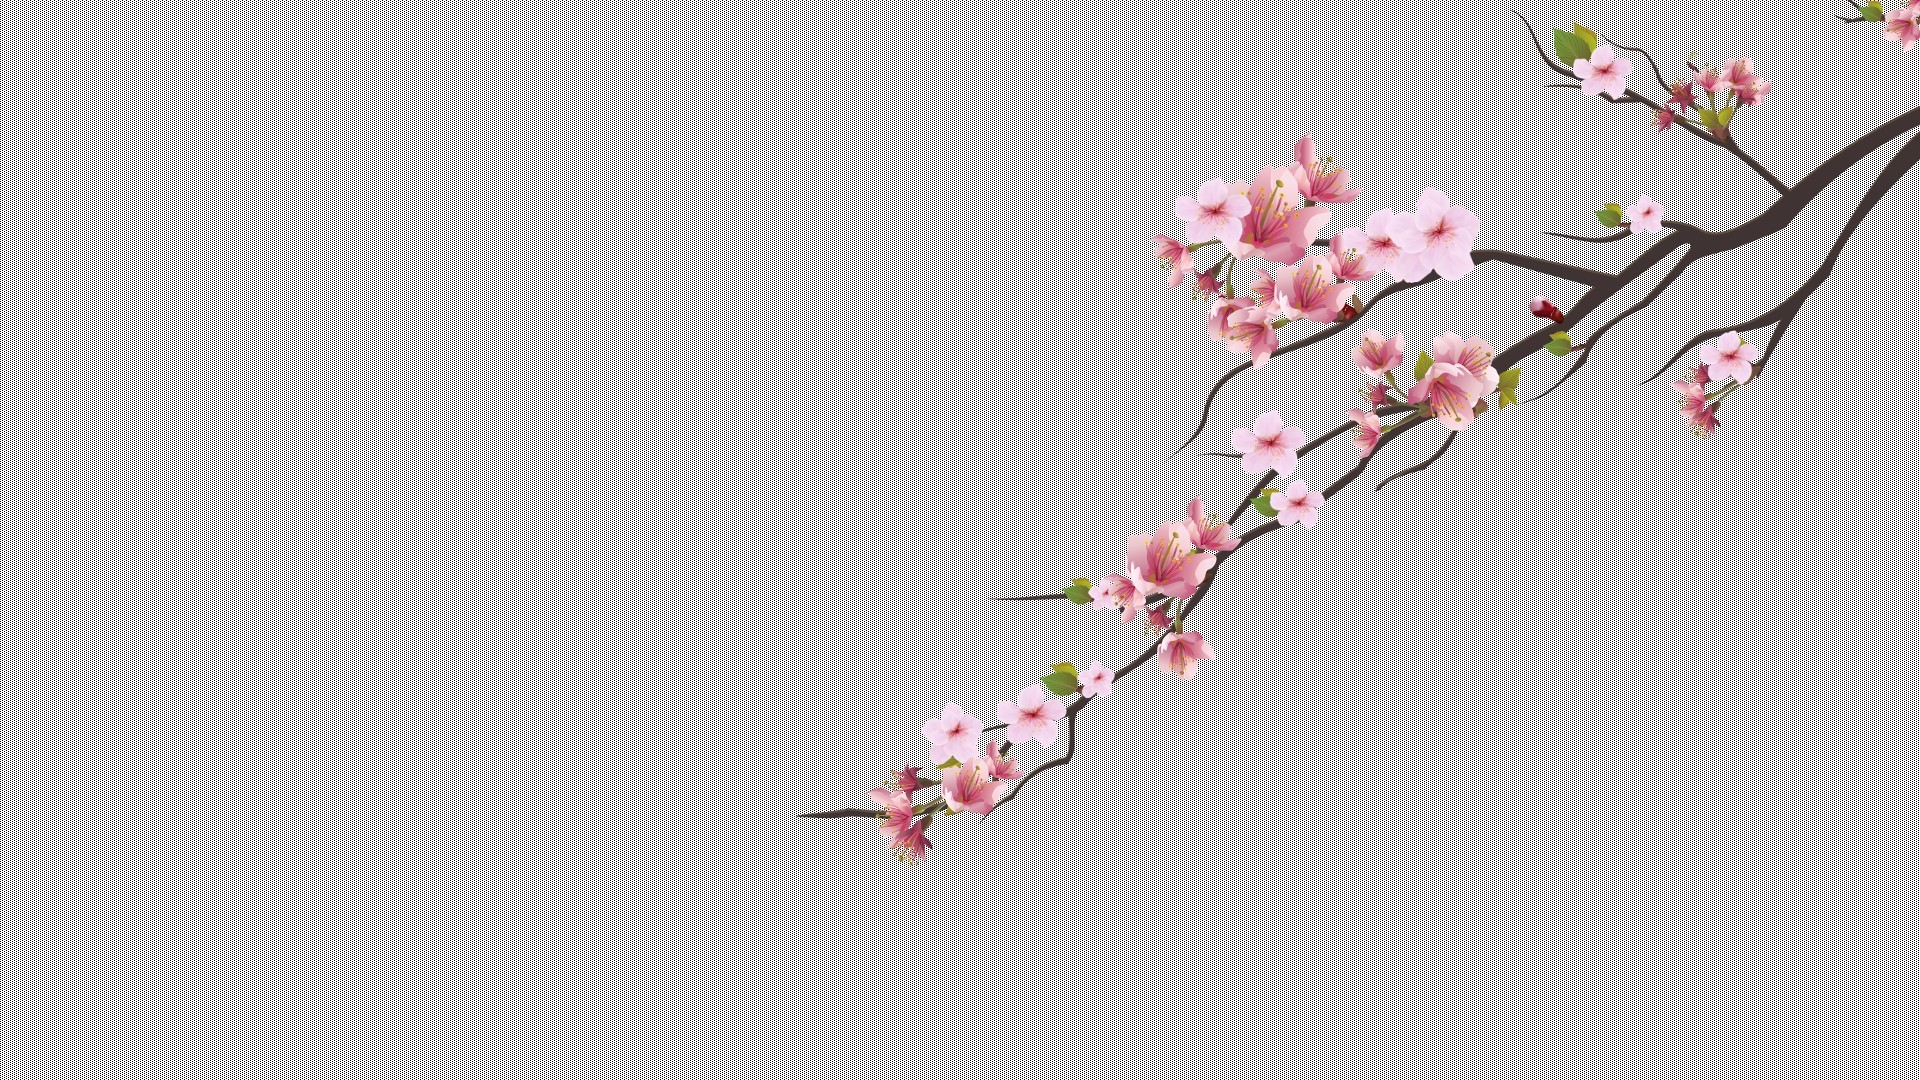 Women's Day Vector Flowers hd image download